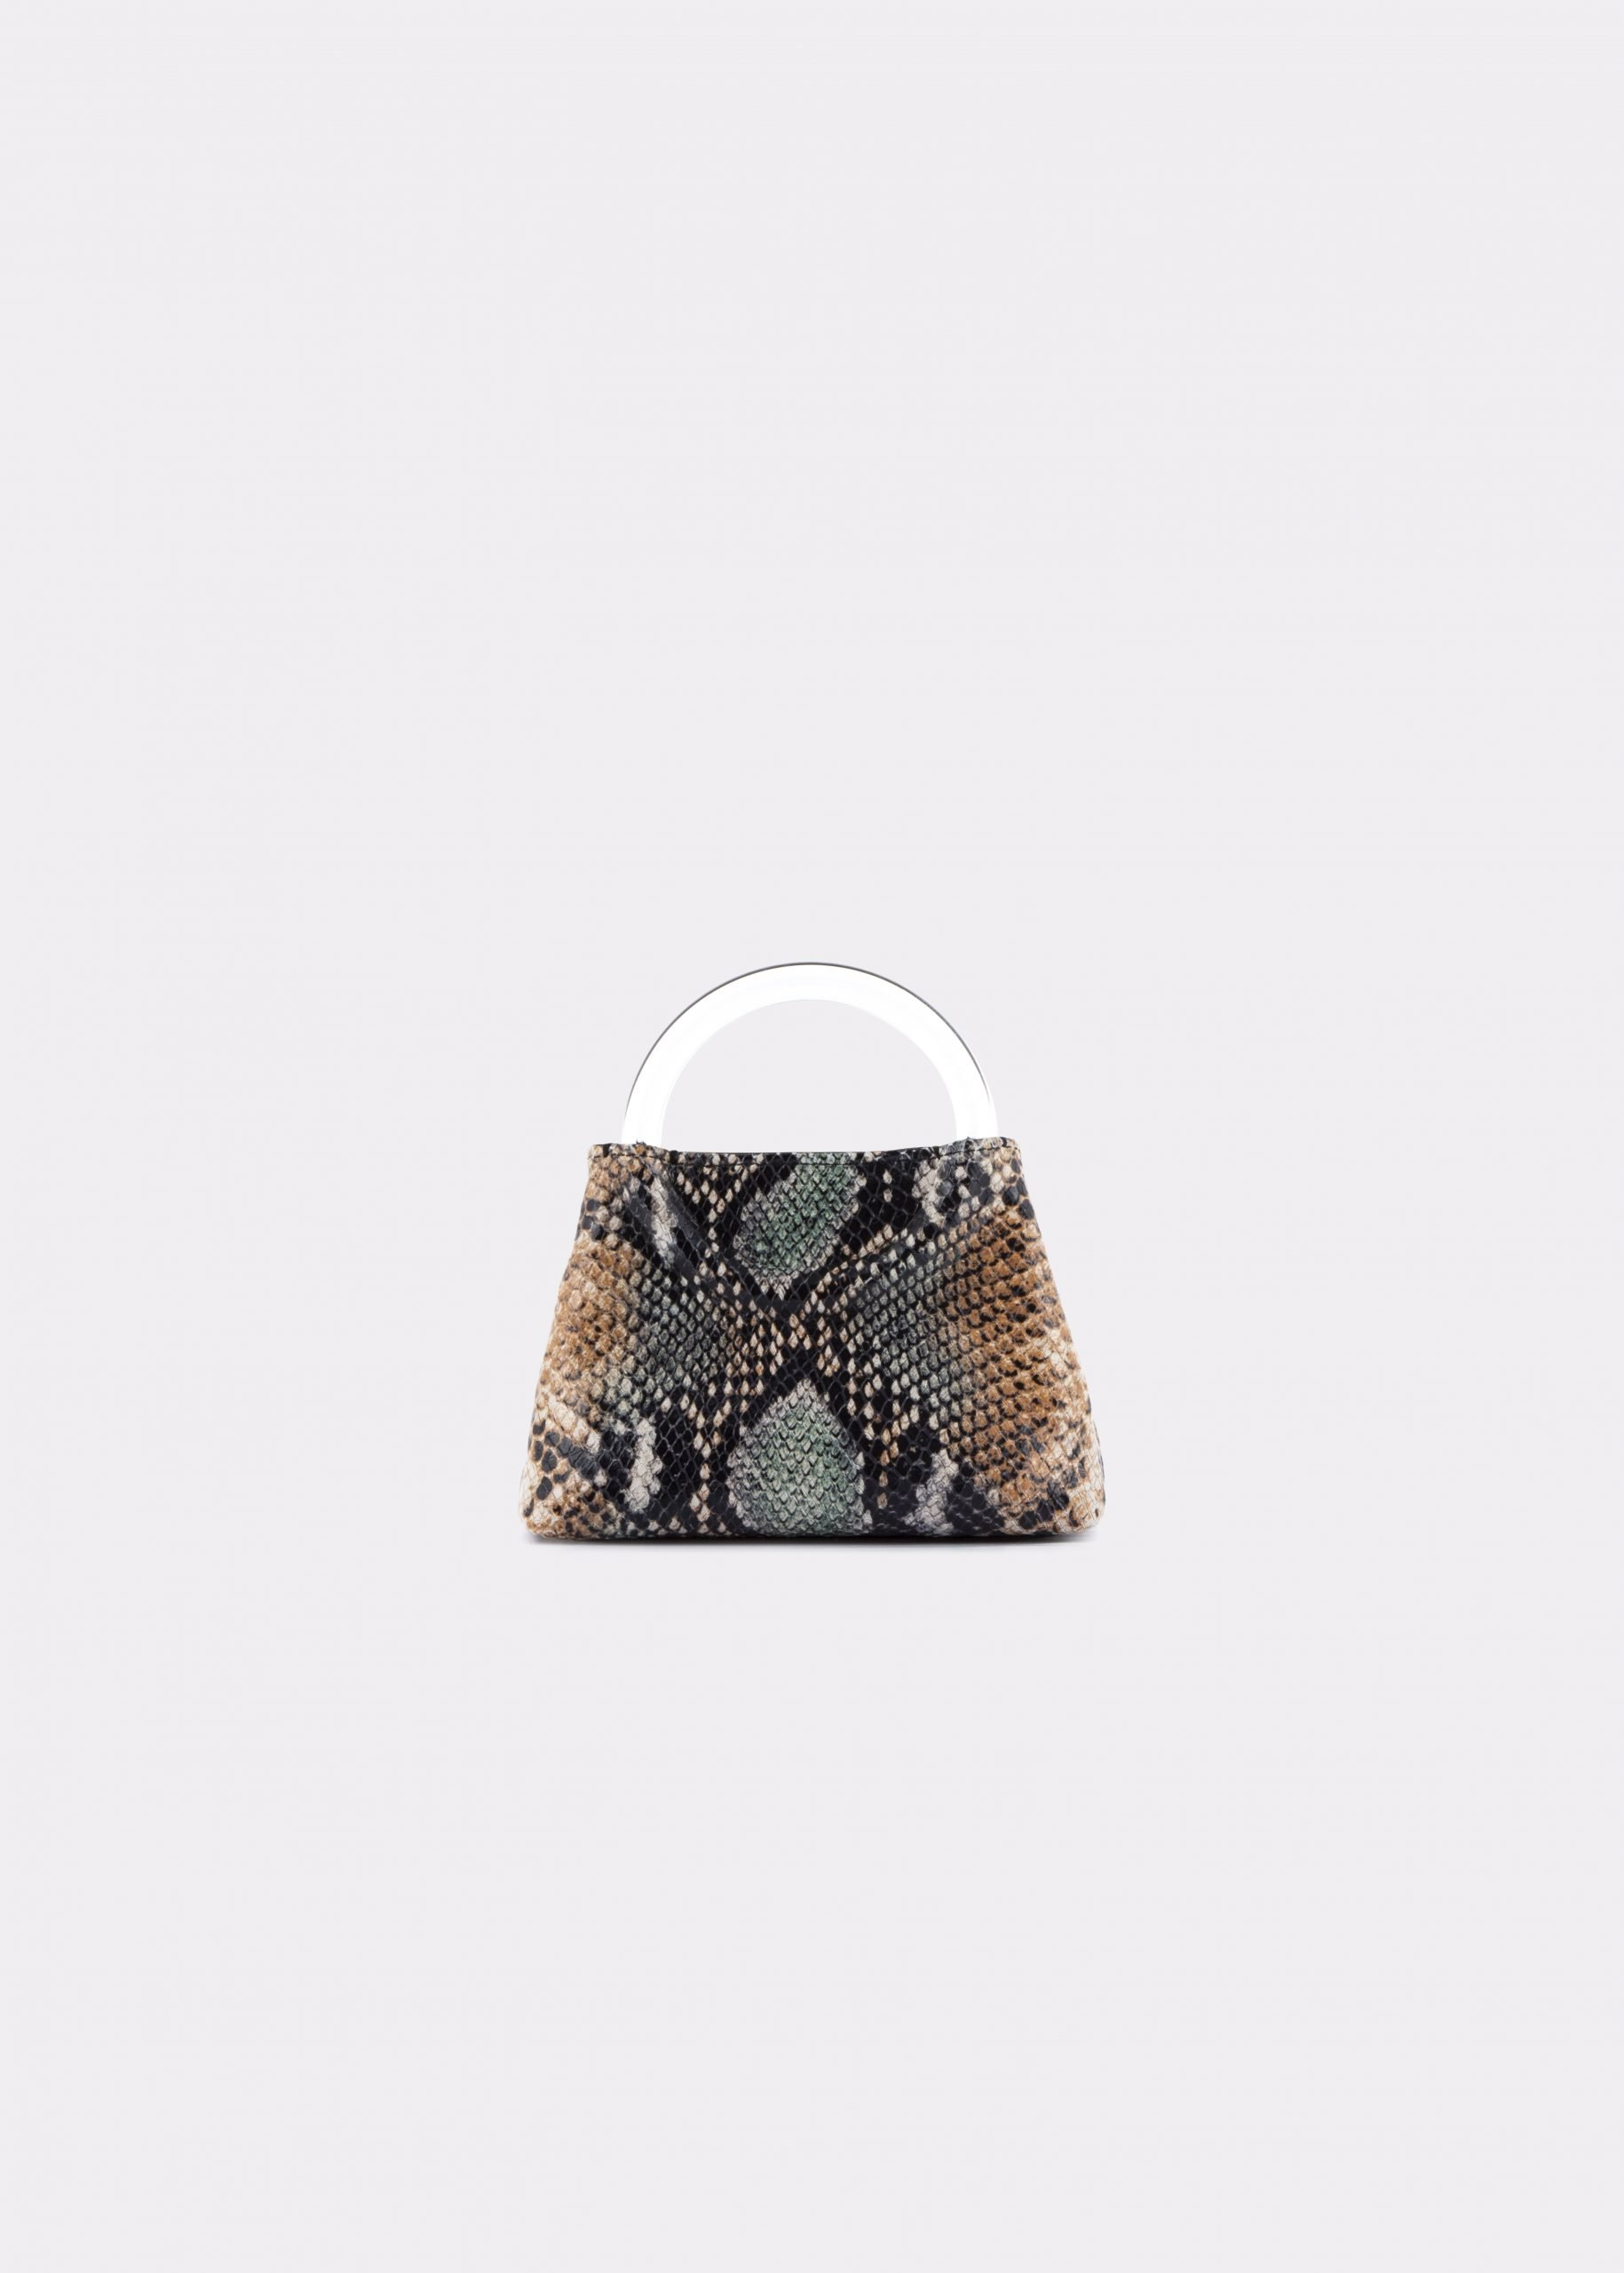 NIDO Bolla Micro bag phyton print leather Plexy_front view